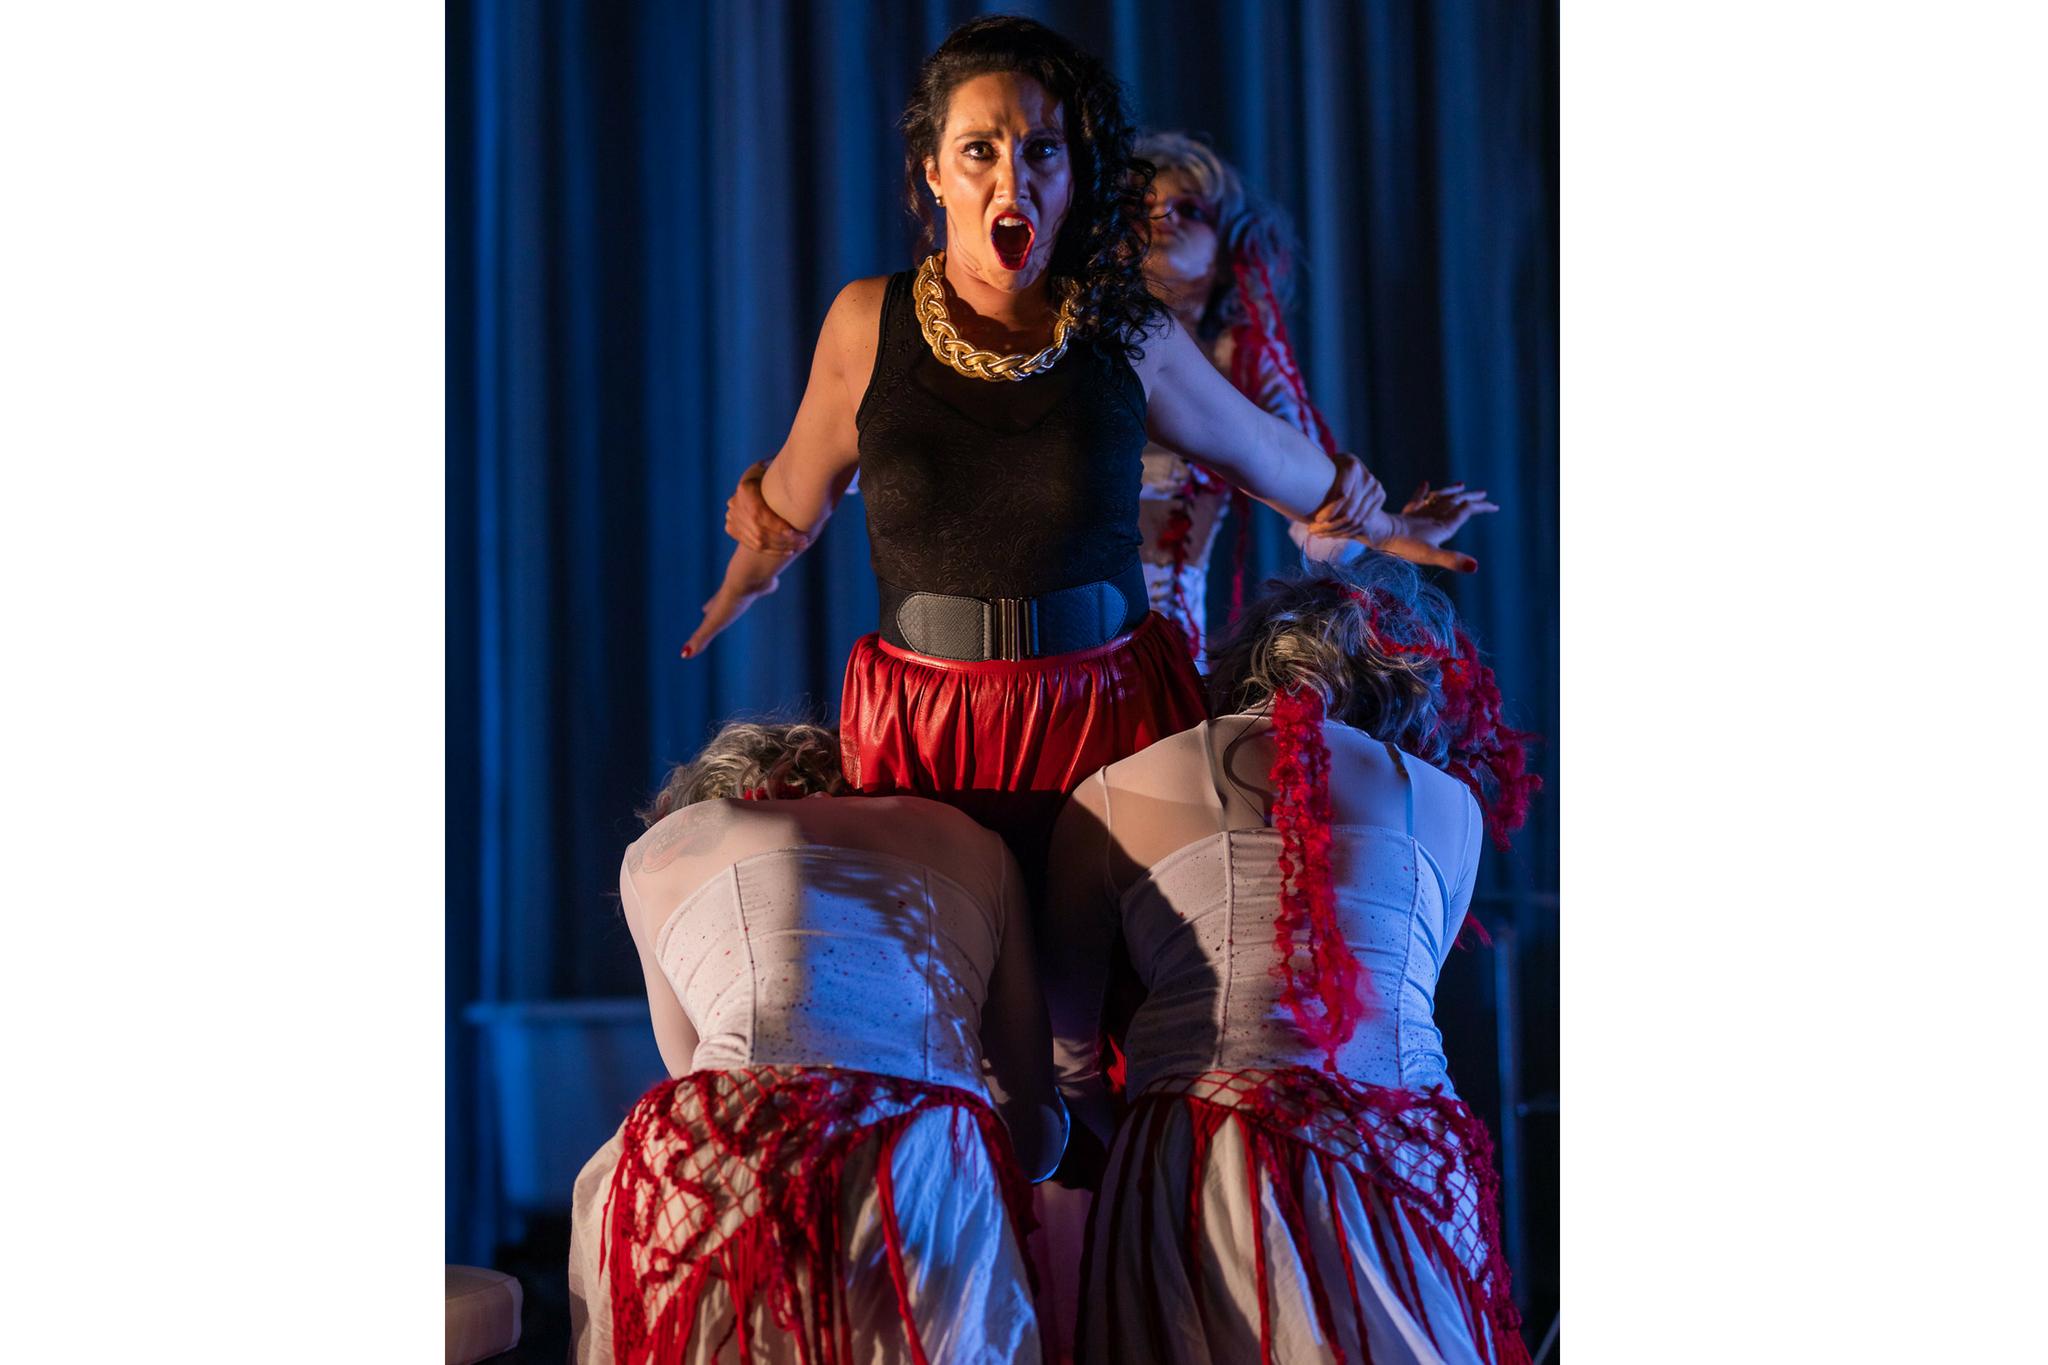 Stefanie Resnick (Lady Macbeth) in Macbeth, CSC2, 2018-Photo by Nile Hawver